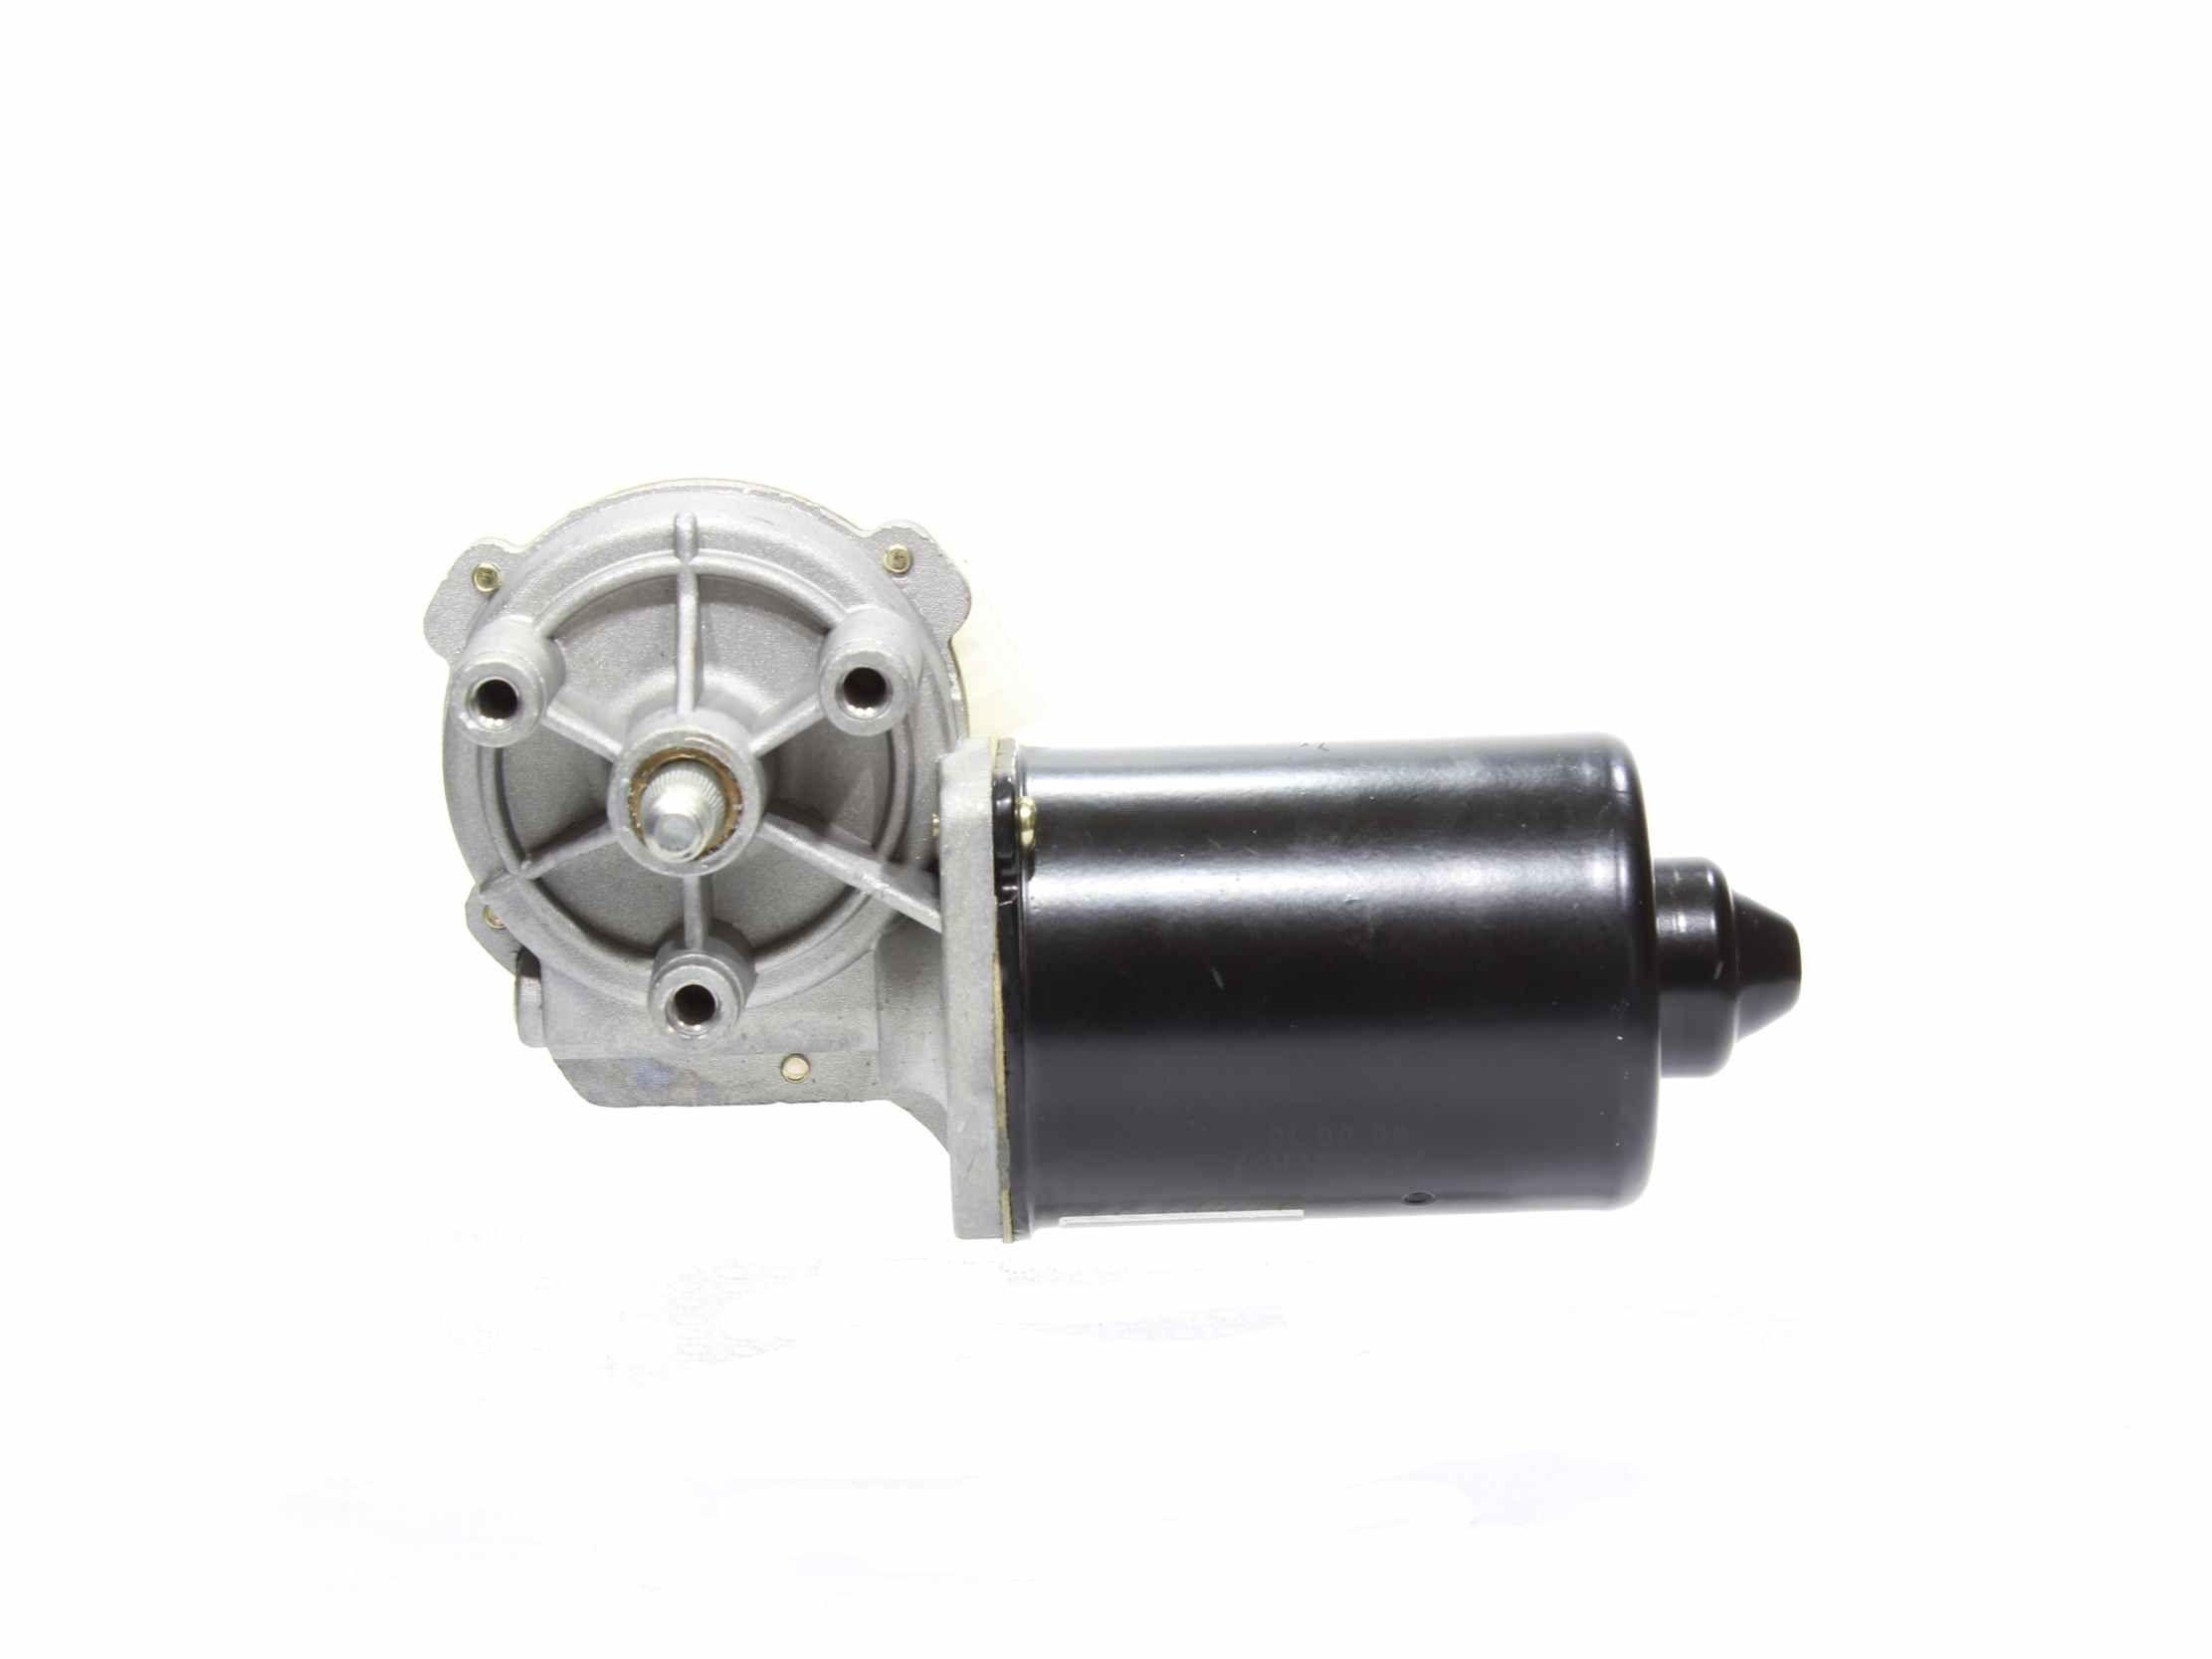 Windshield Wiper Motor 10800010 ALANKO 800010 original quality